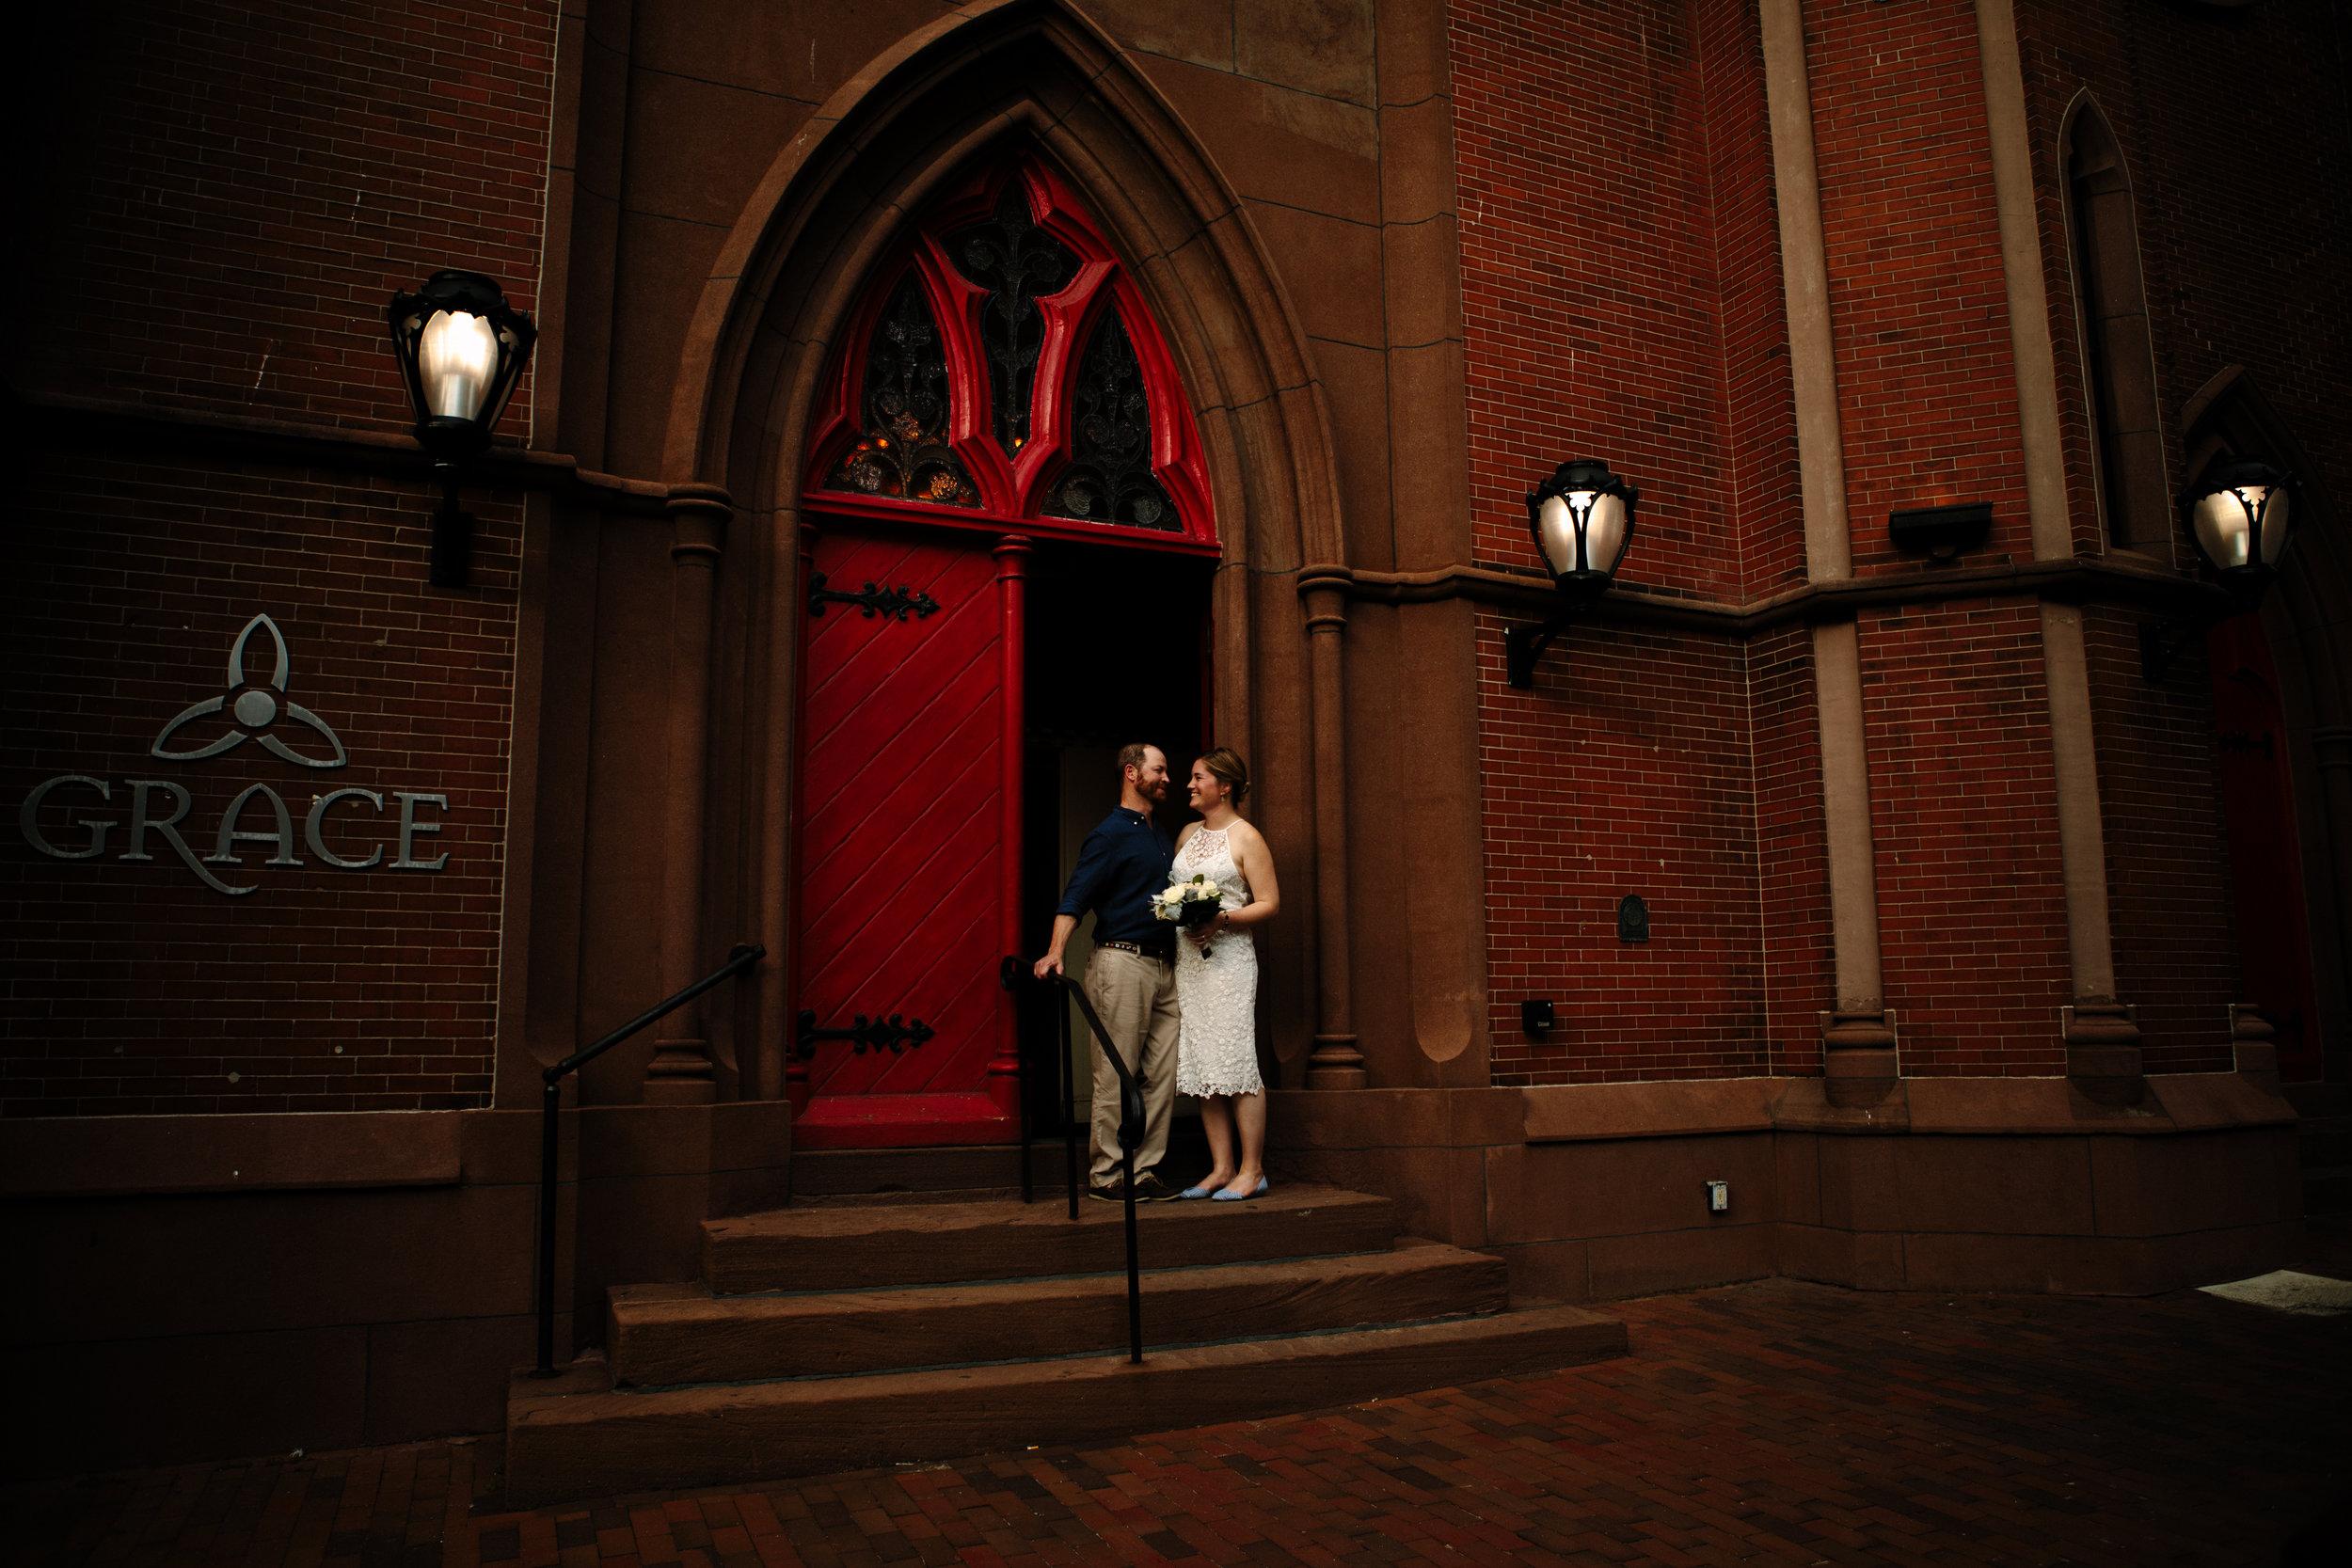 portland-maine-wedding-at-grace-portland-1.jpg